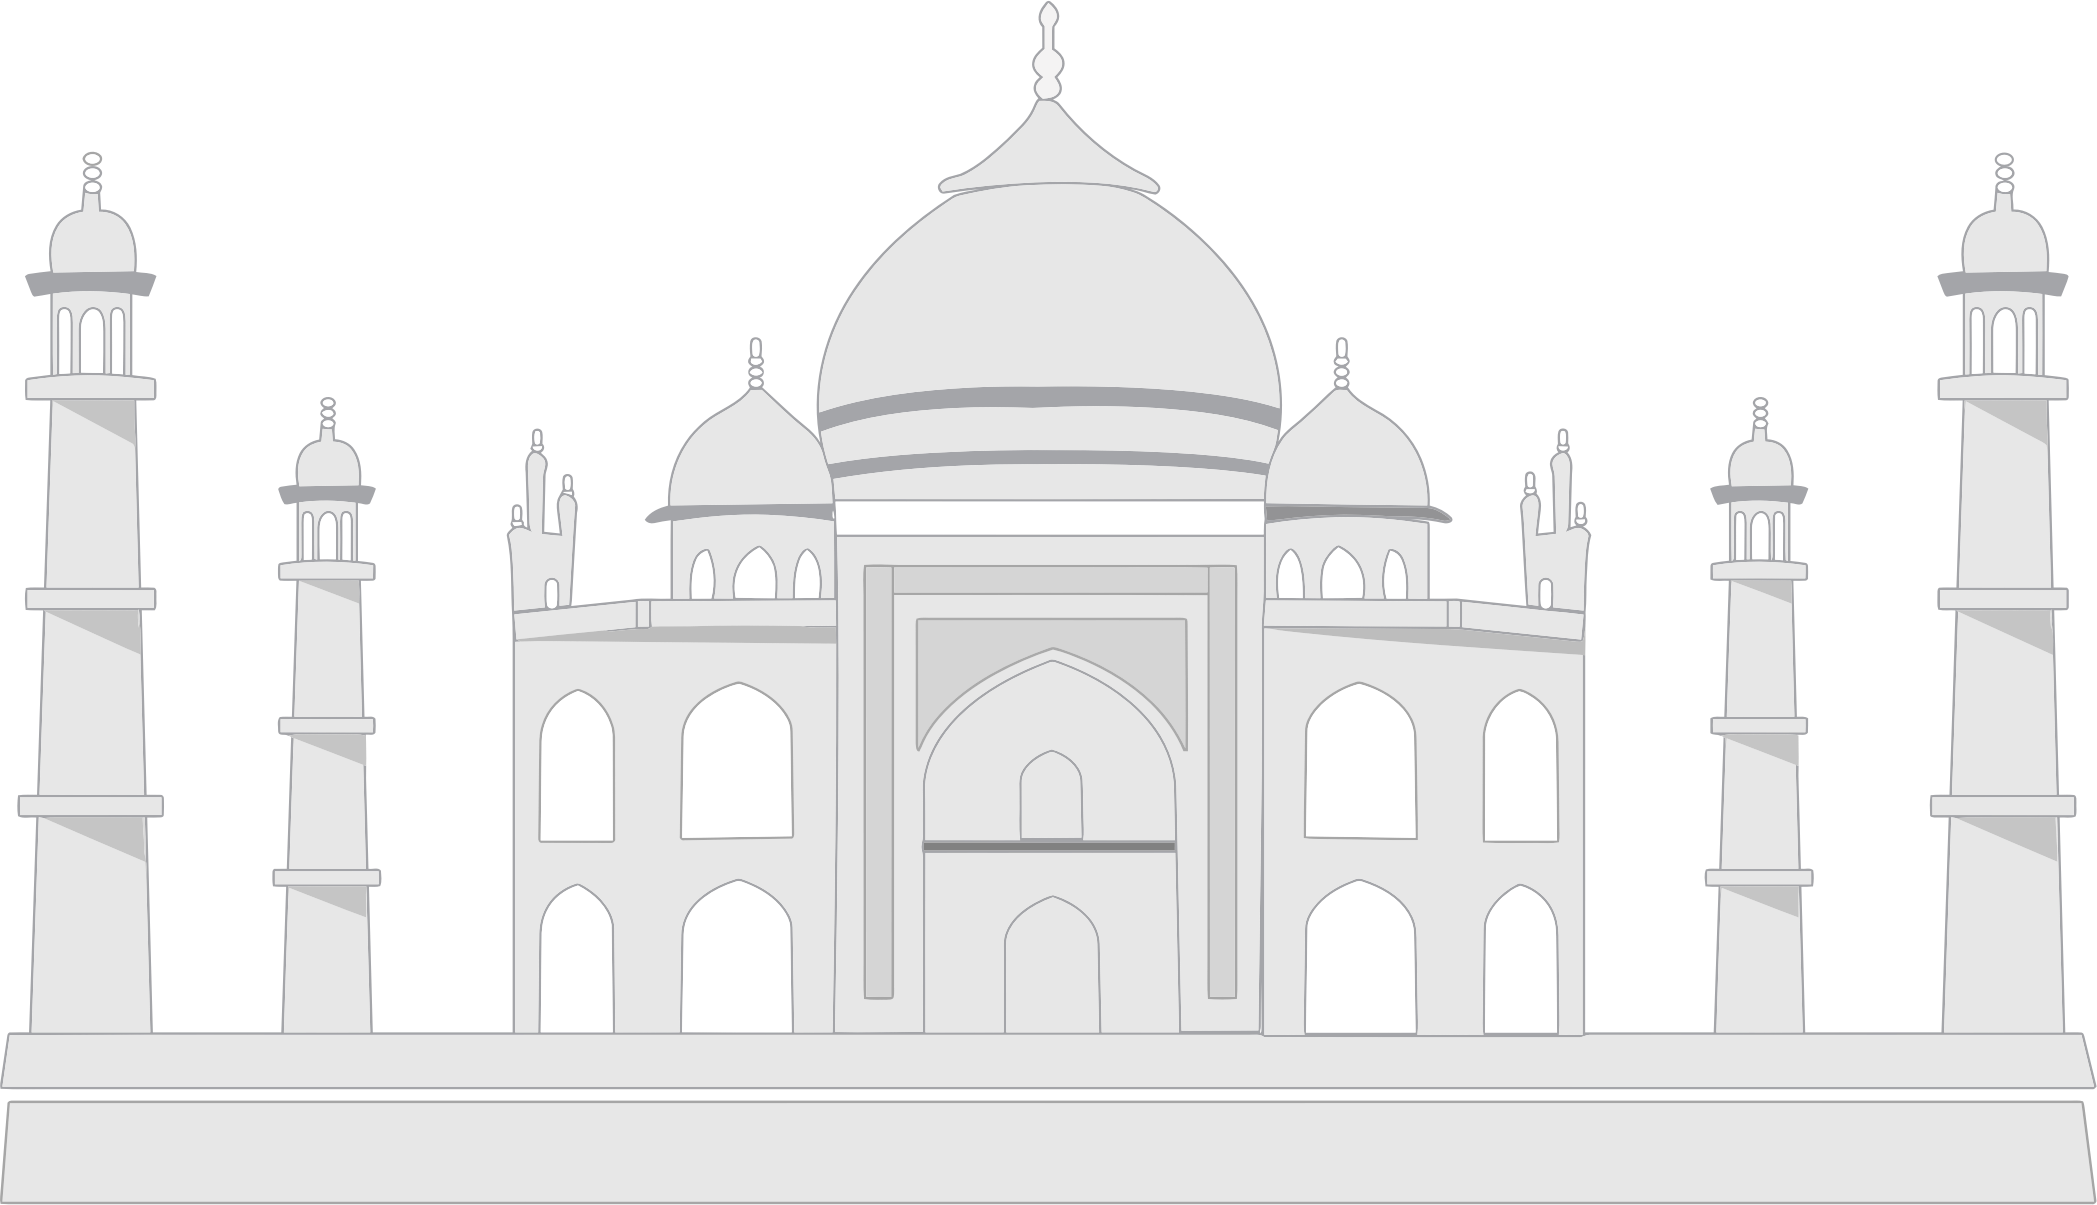 PNG File Name: Taj Mahal Transparent Background - Taj Mahal PNG